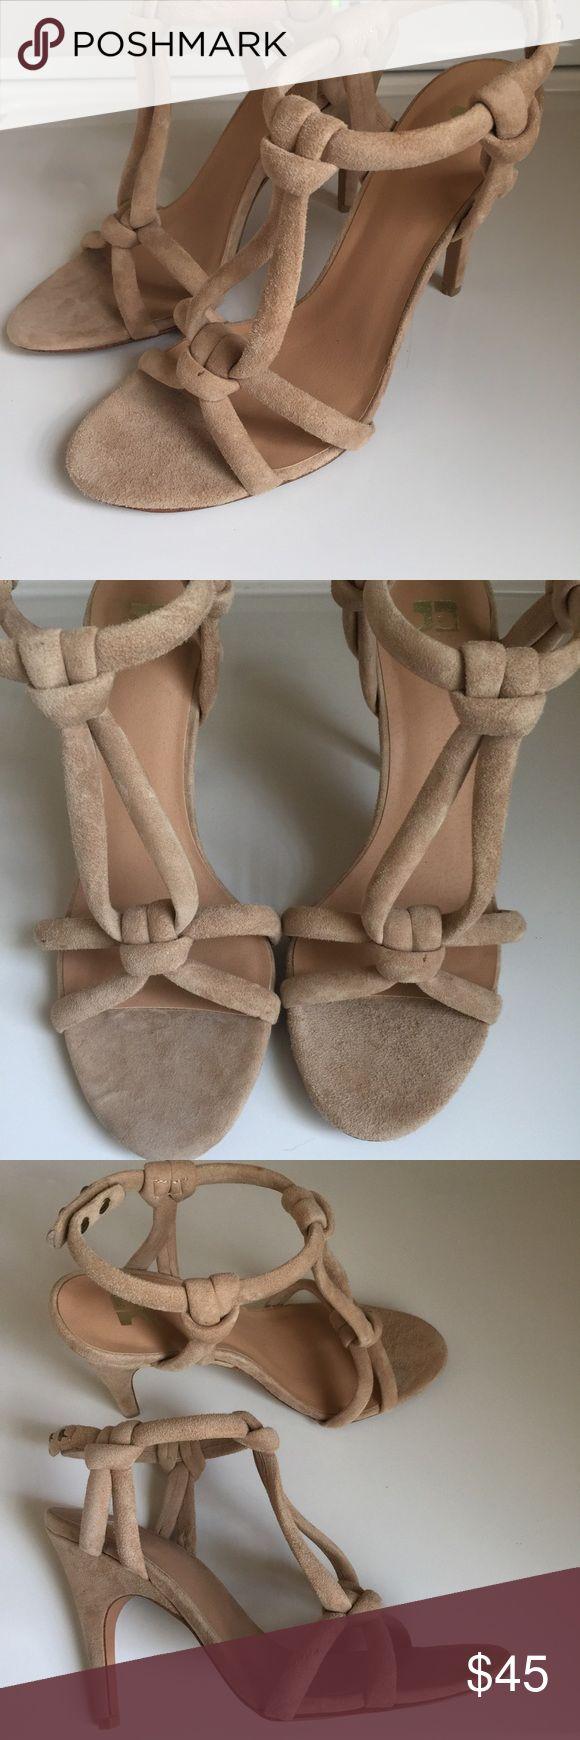 JOES HEELS SUEDE Great condition JOES Shoes Heels